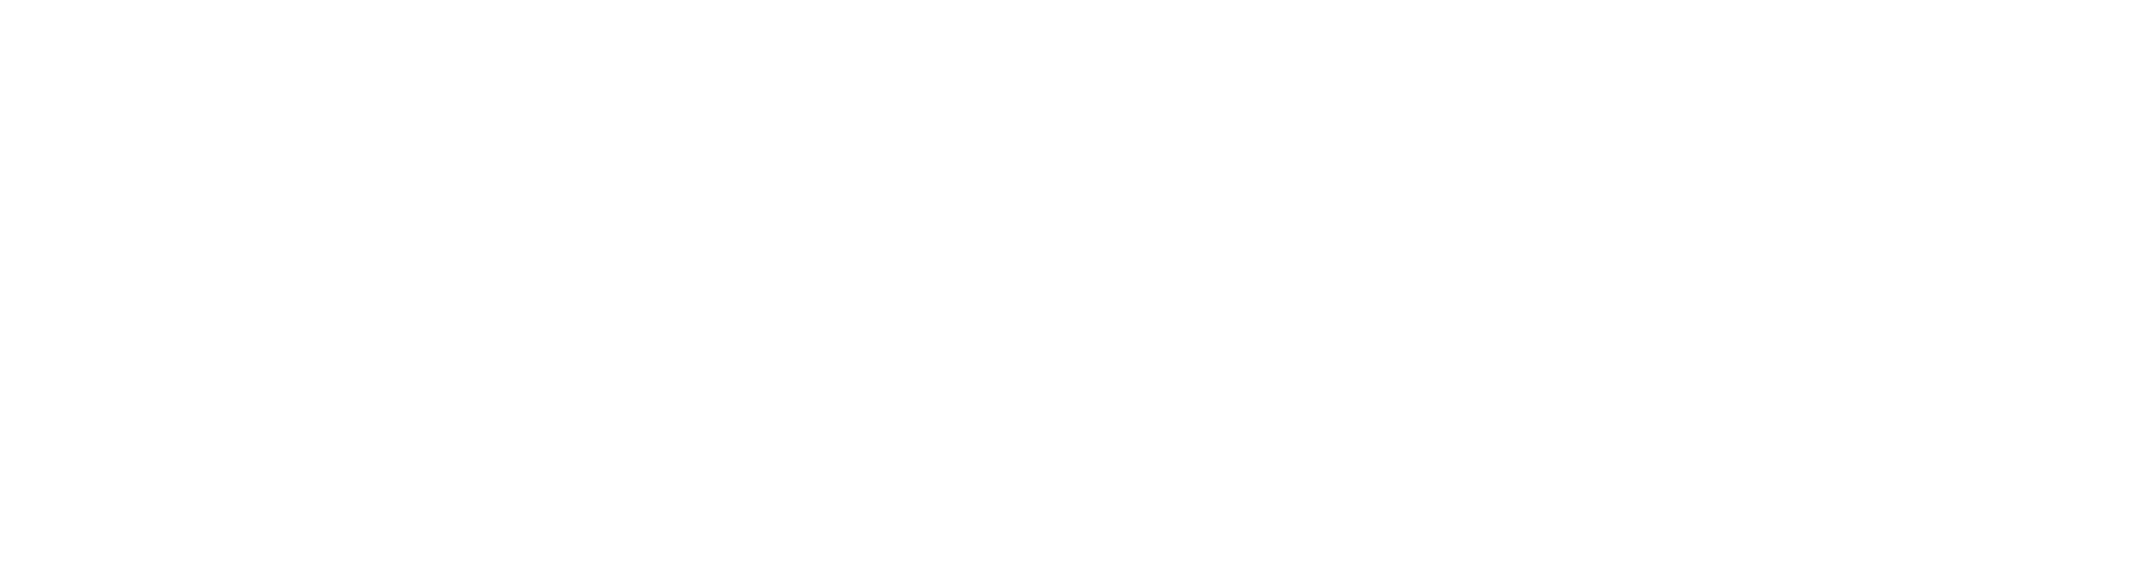 edoc logo weiss-1